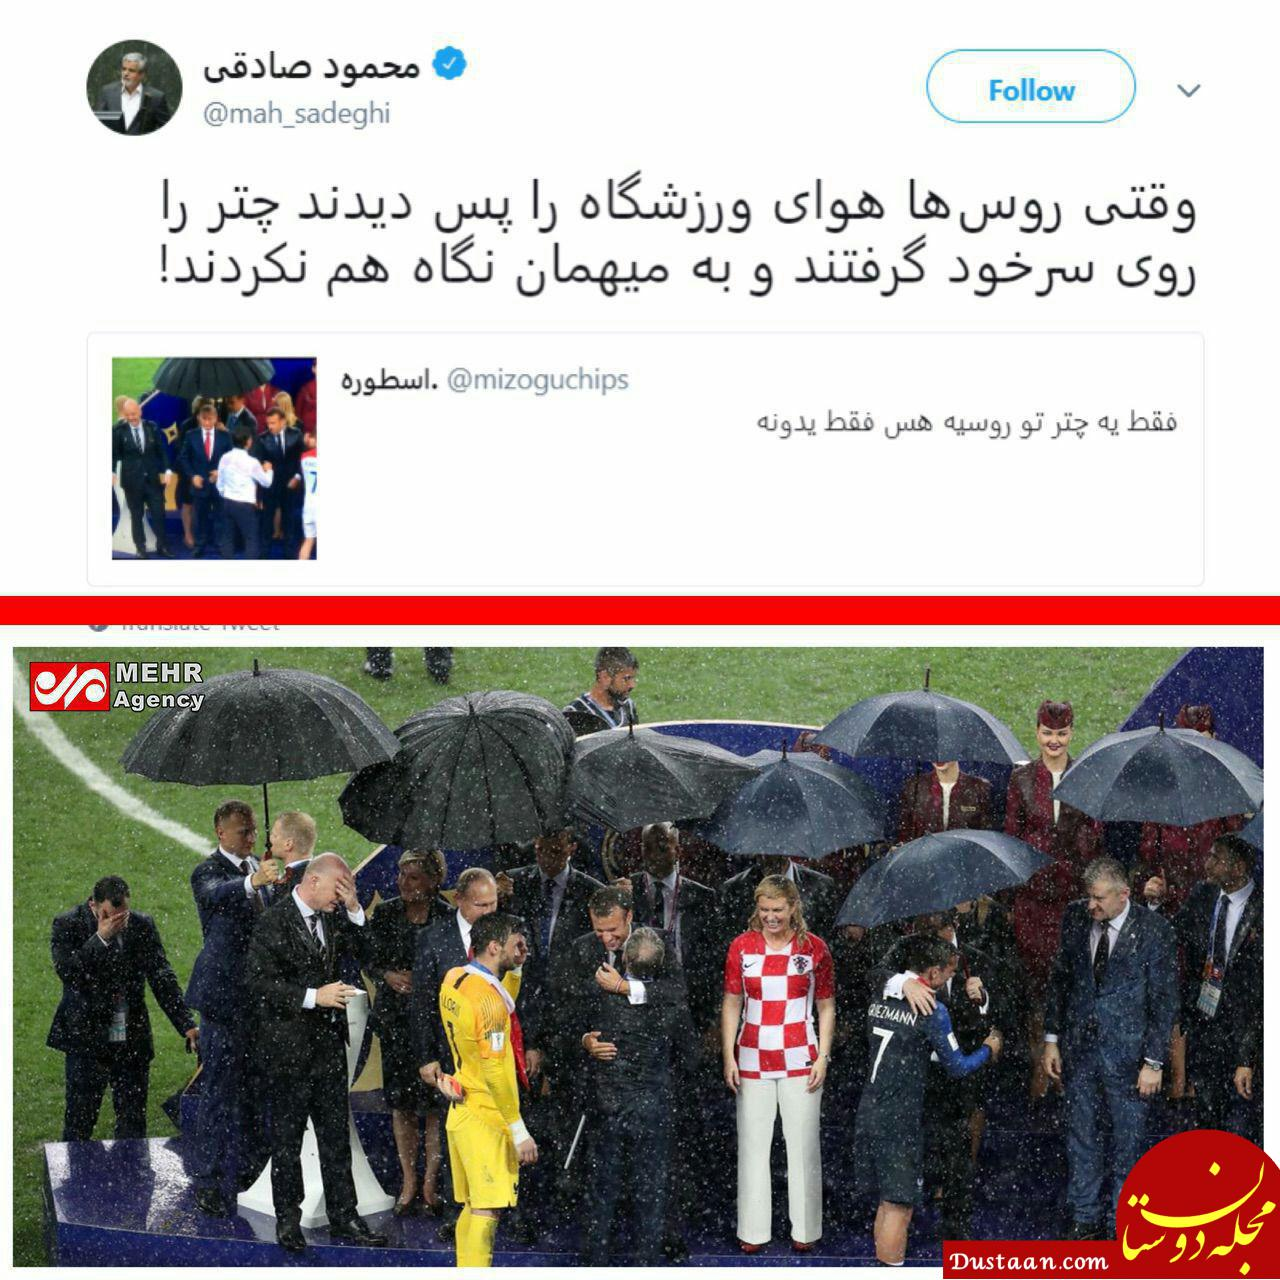 www.dustaan.com توییت محمود صادقی درباره مراسم قهرمانی جام جهانی